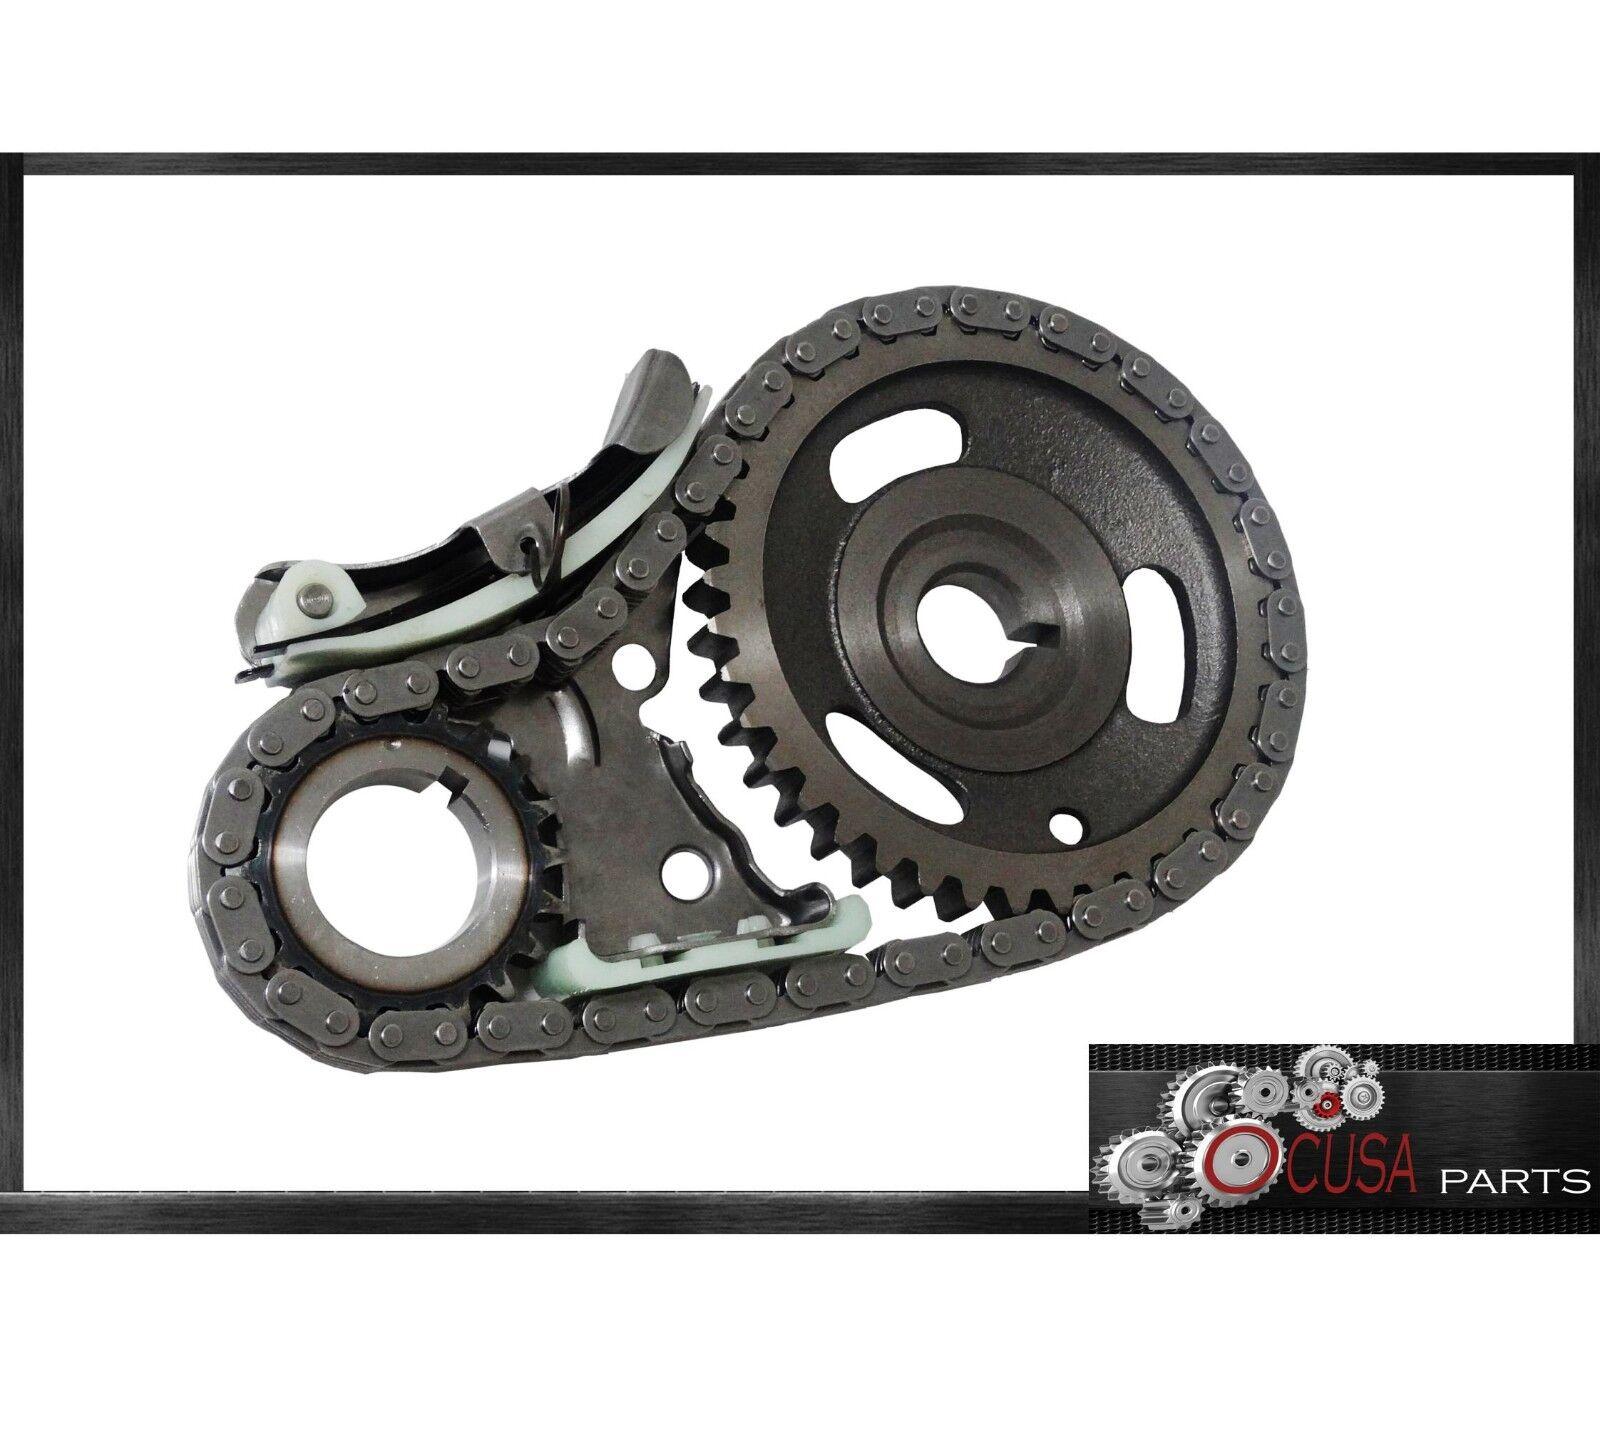 57 Vortec Timing Chain Ebay